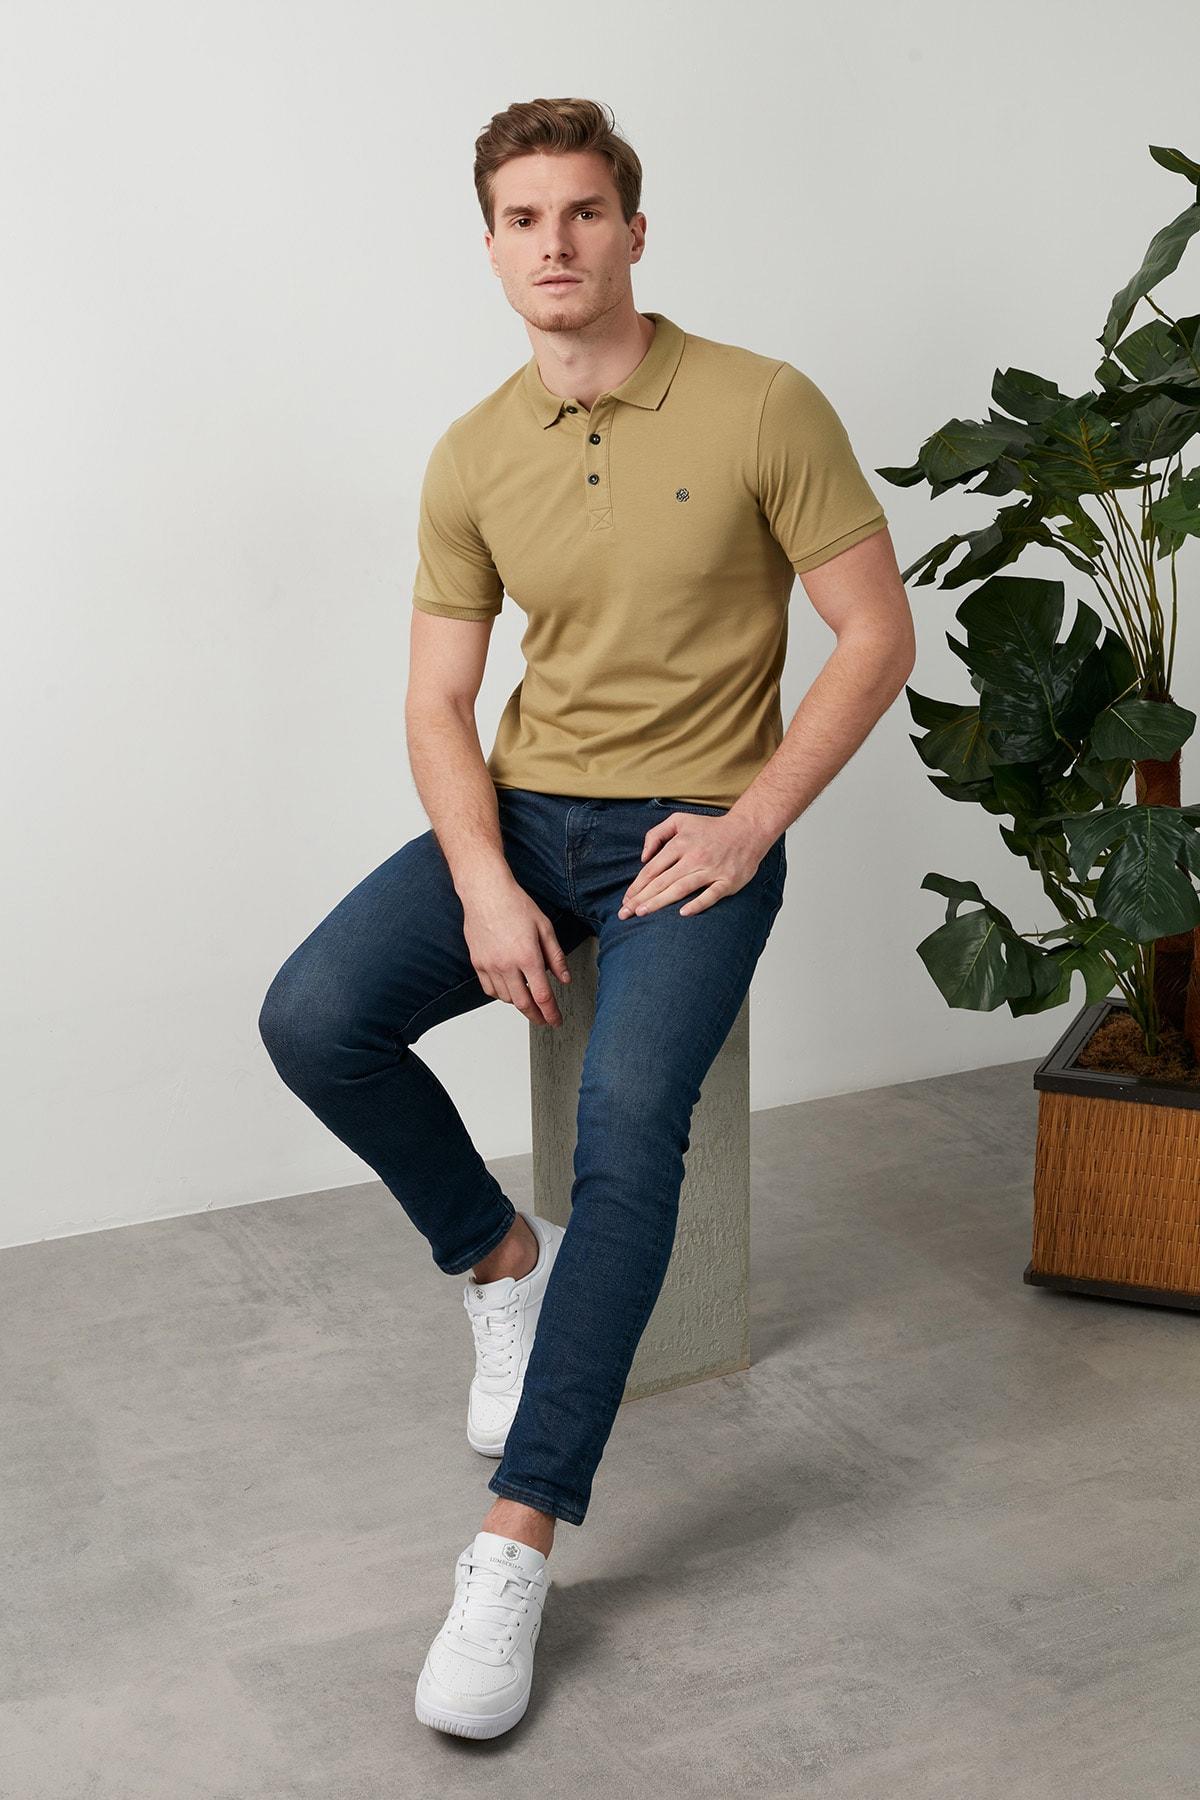 Erkek Açık Haki Düğmeli Polo Yaka Standart Fit Pamuklu T Shirt 0438101